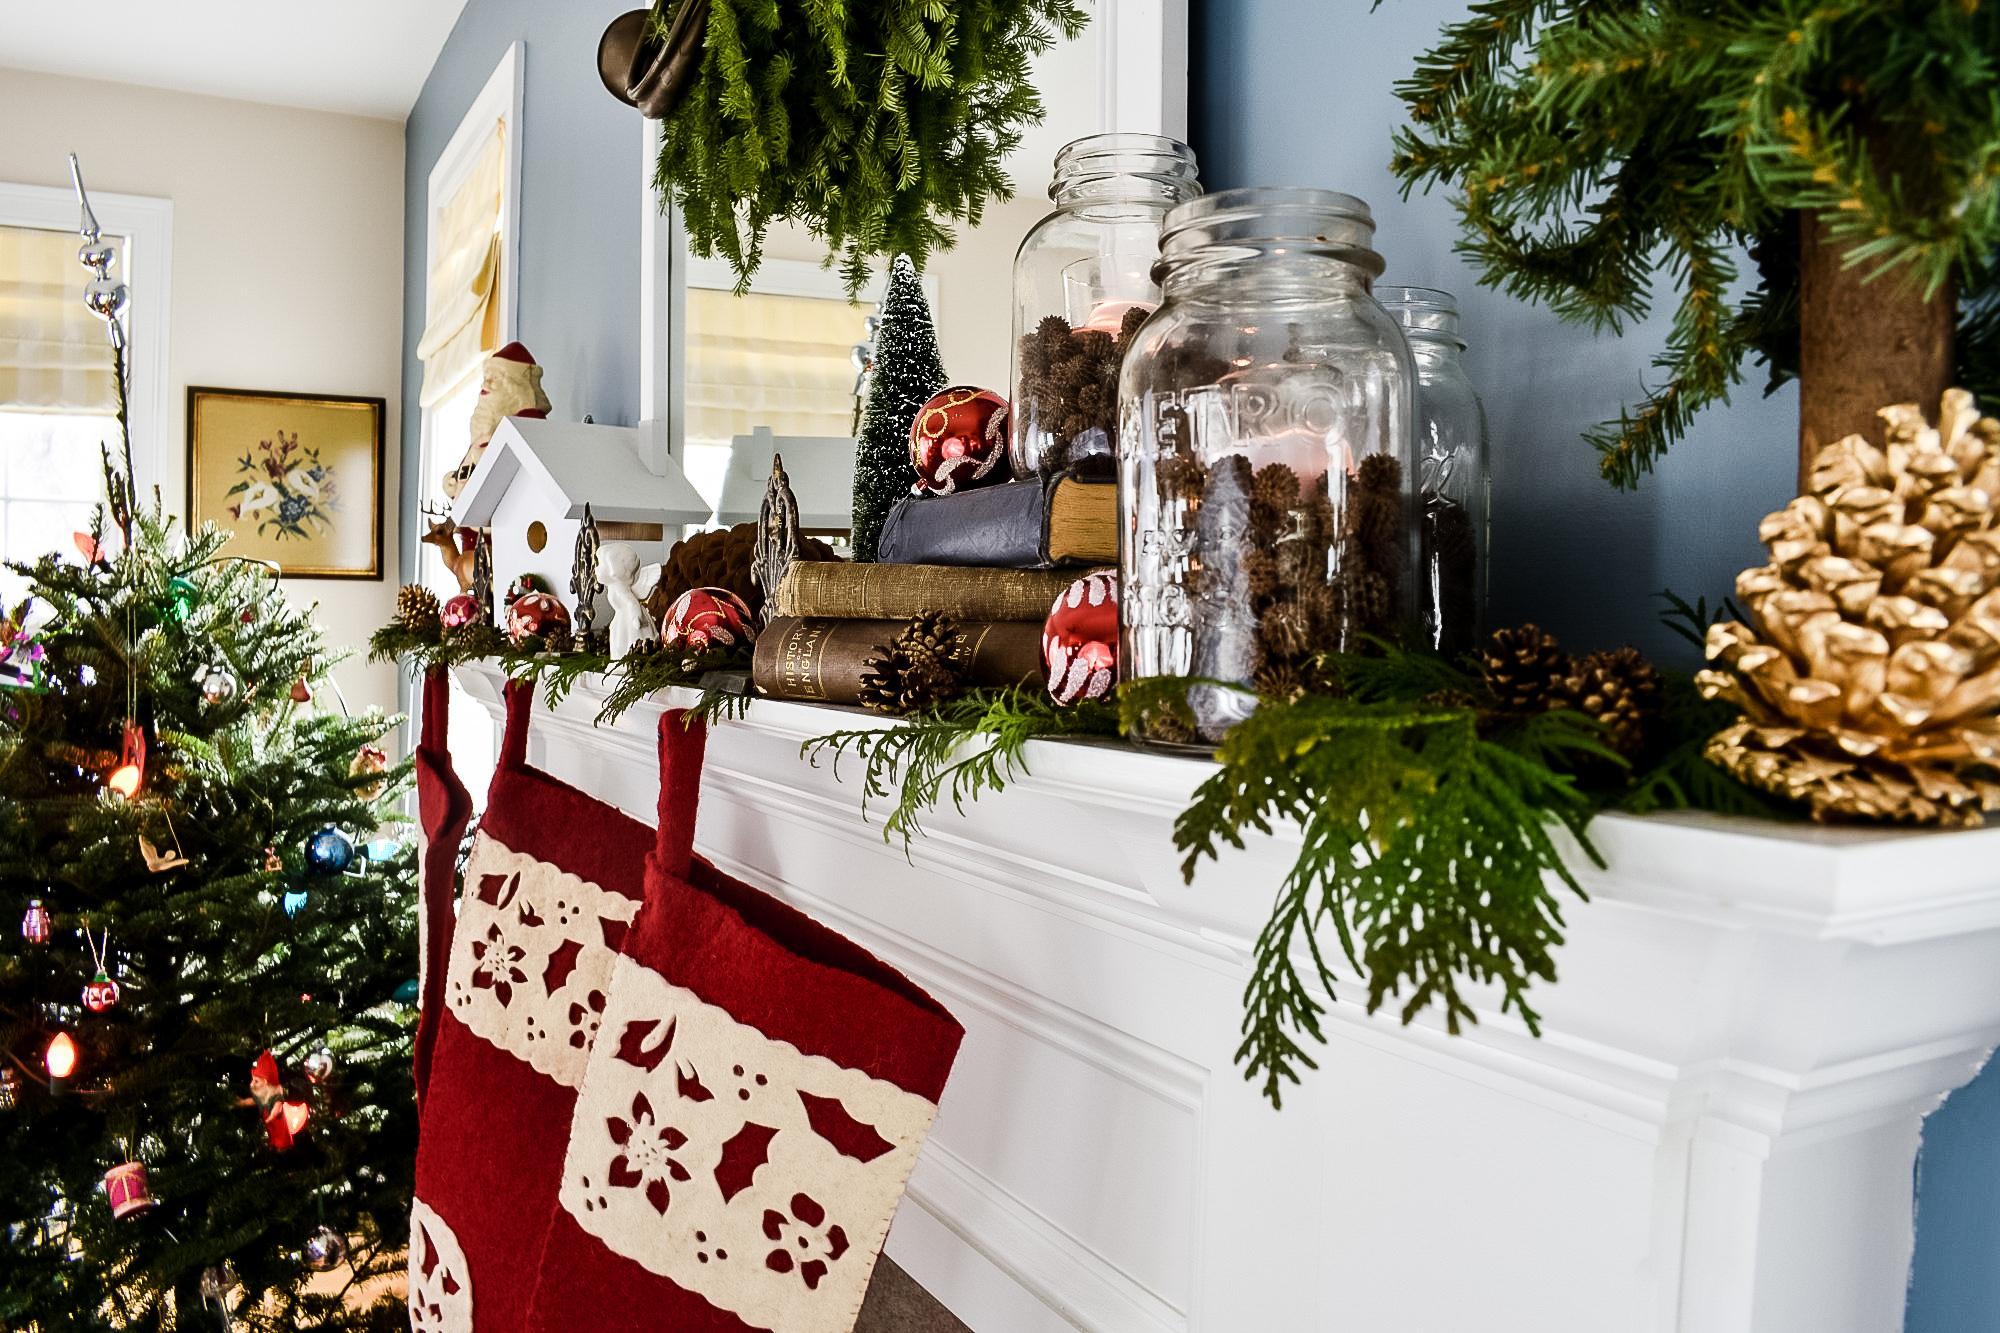 red felt stockings hung on a Christmas mantel